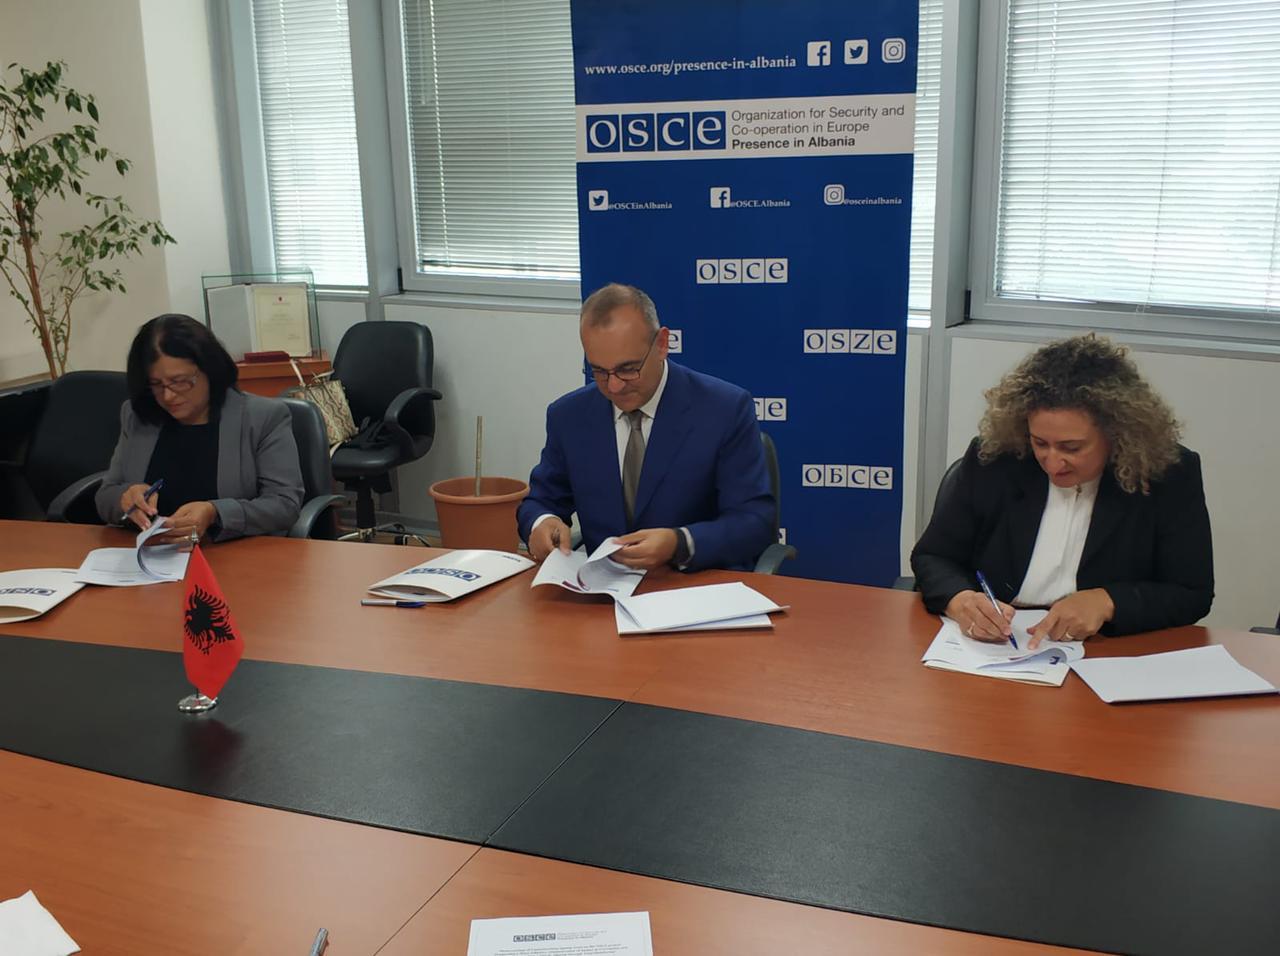 Foto - OSCE - 2